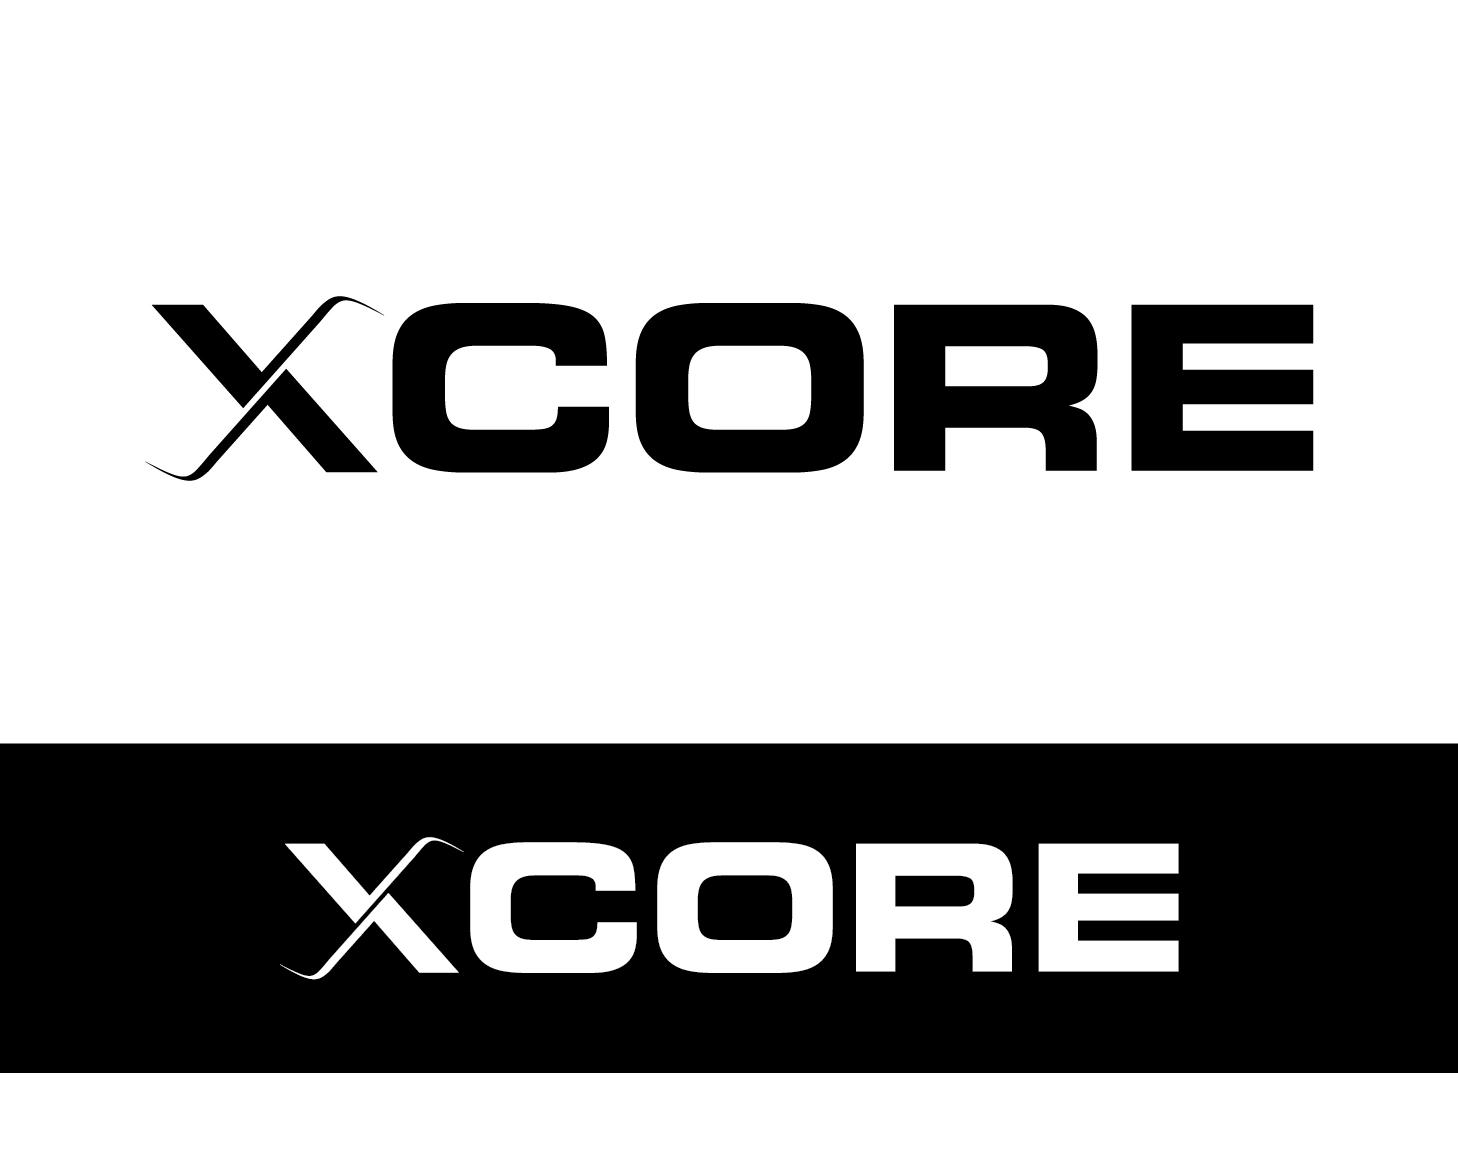 wheel logo design for x core or xcore by adam design 4654227 rh designcrowd com  rim brand logos